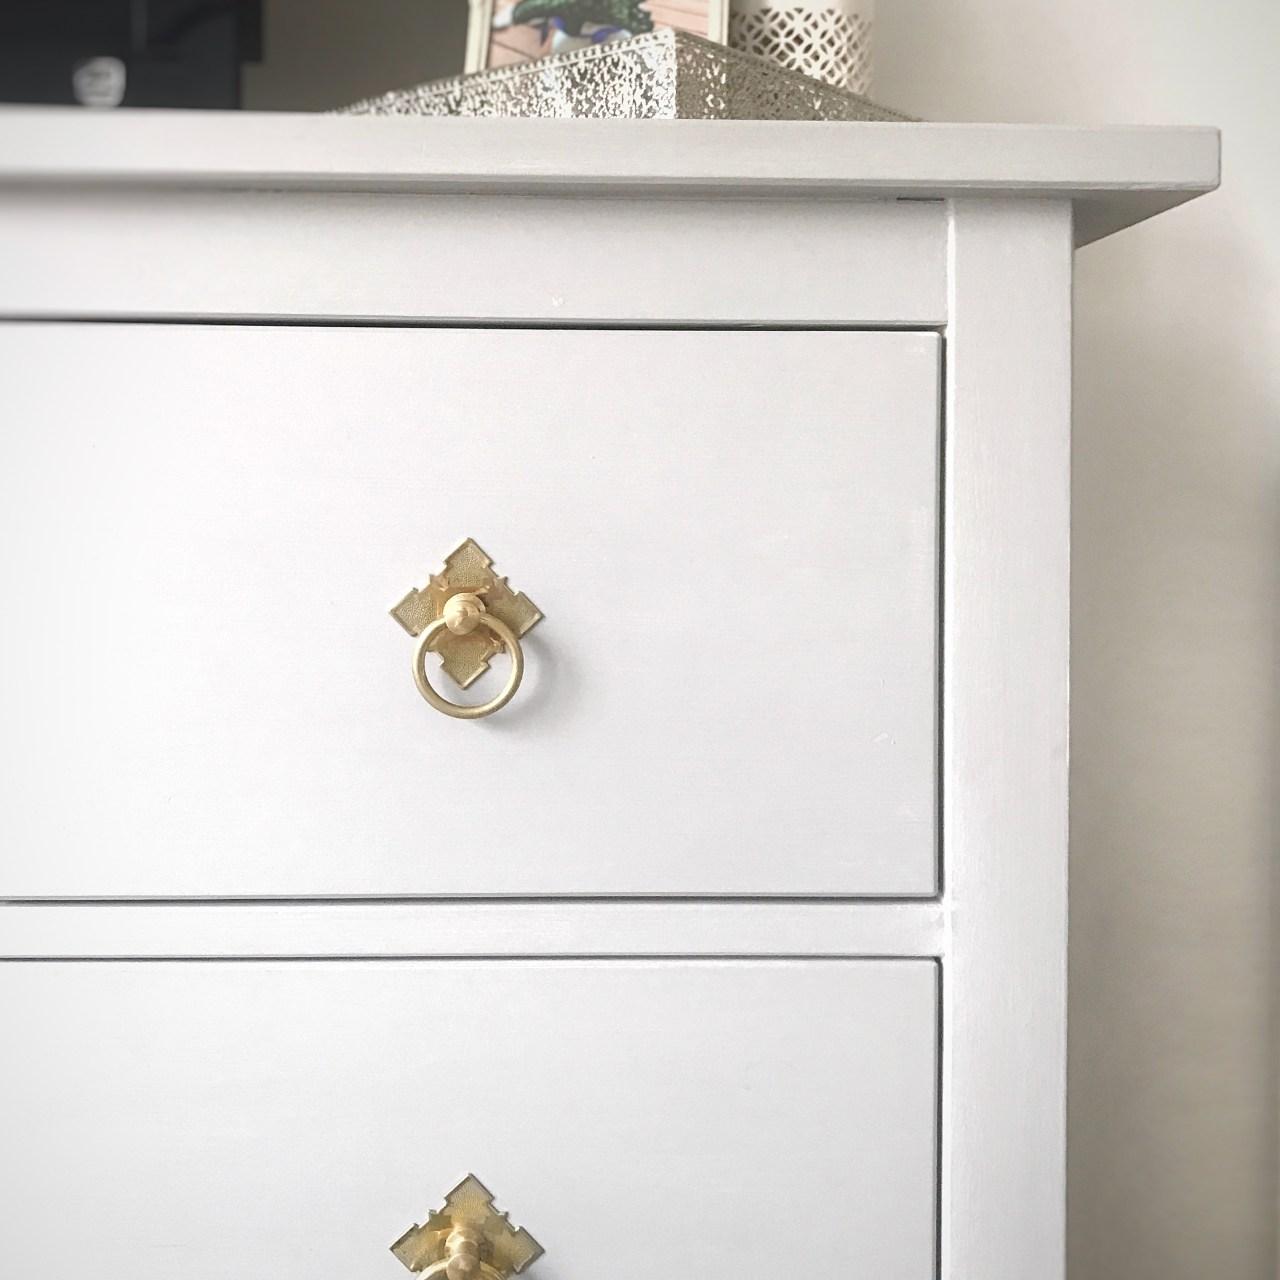 DIY IKEA Hack